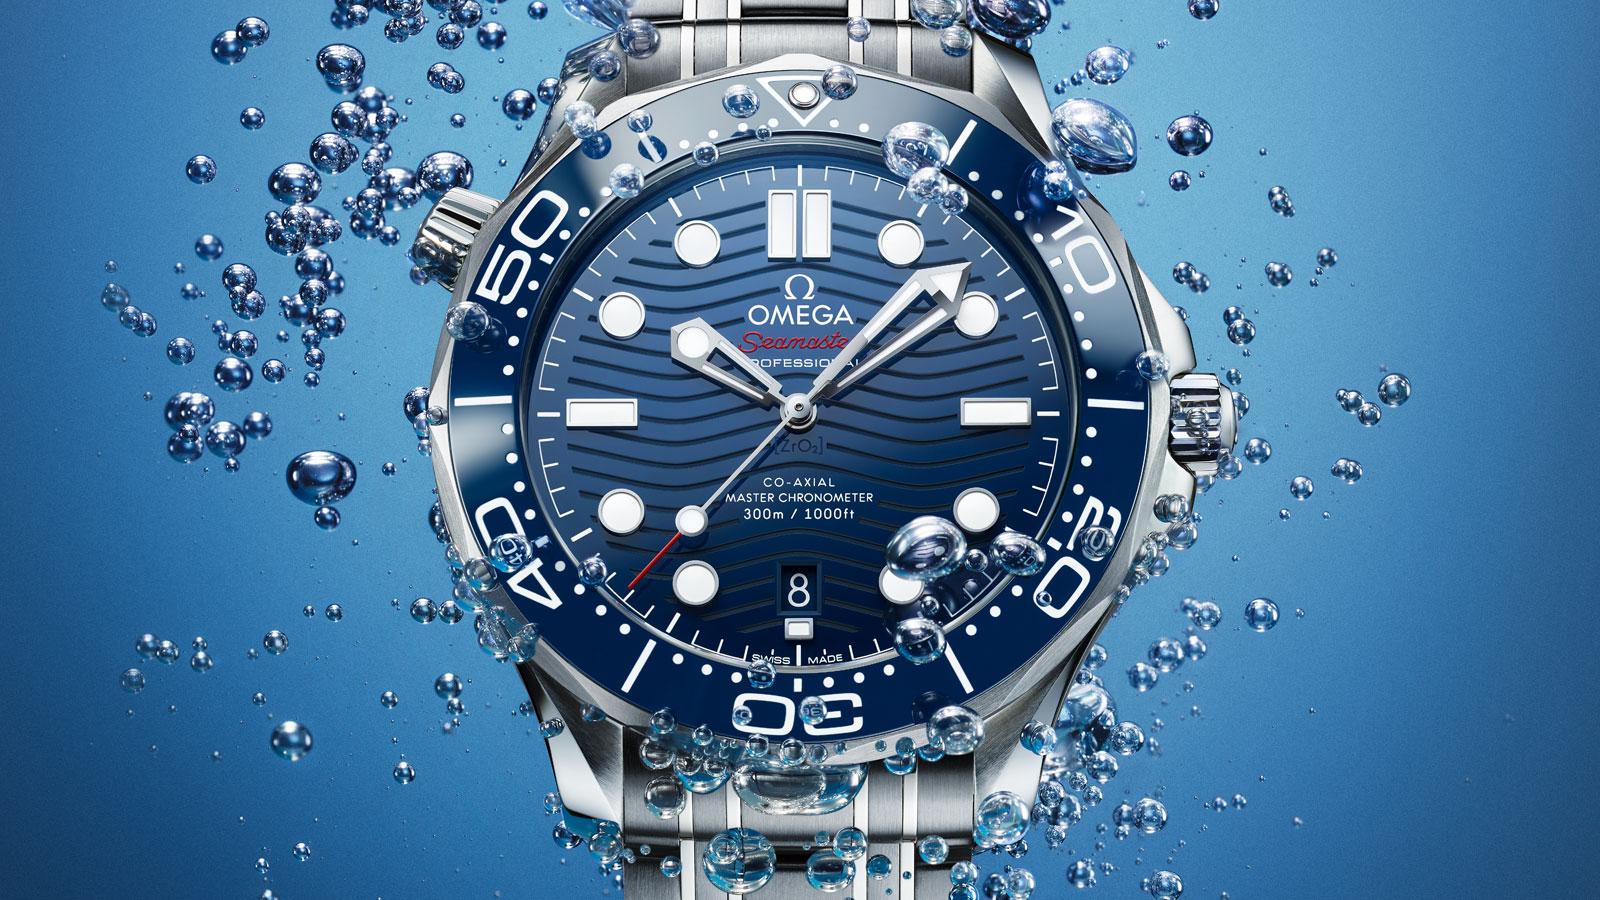 Seamaster 300米潜水表 300米潜水表 欧米茄同轴•至臻天文台表42毫米 腕表 - 210.30.42.20.03.001